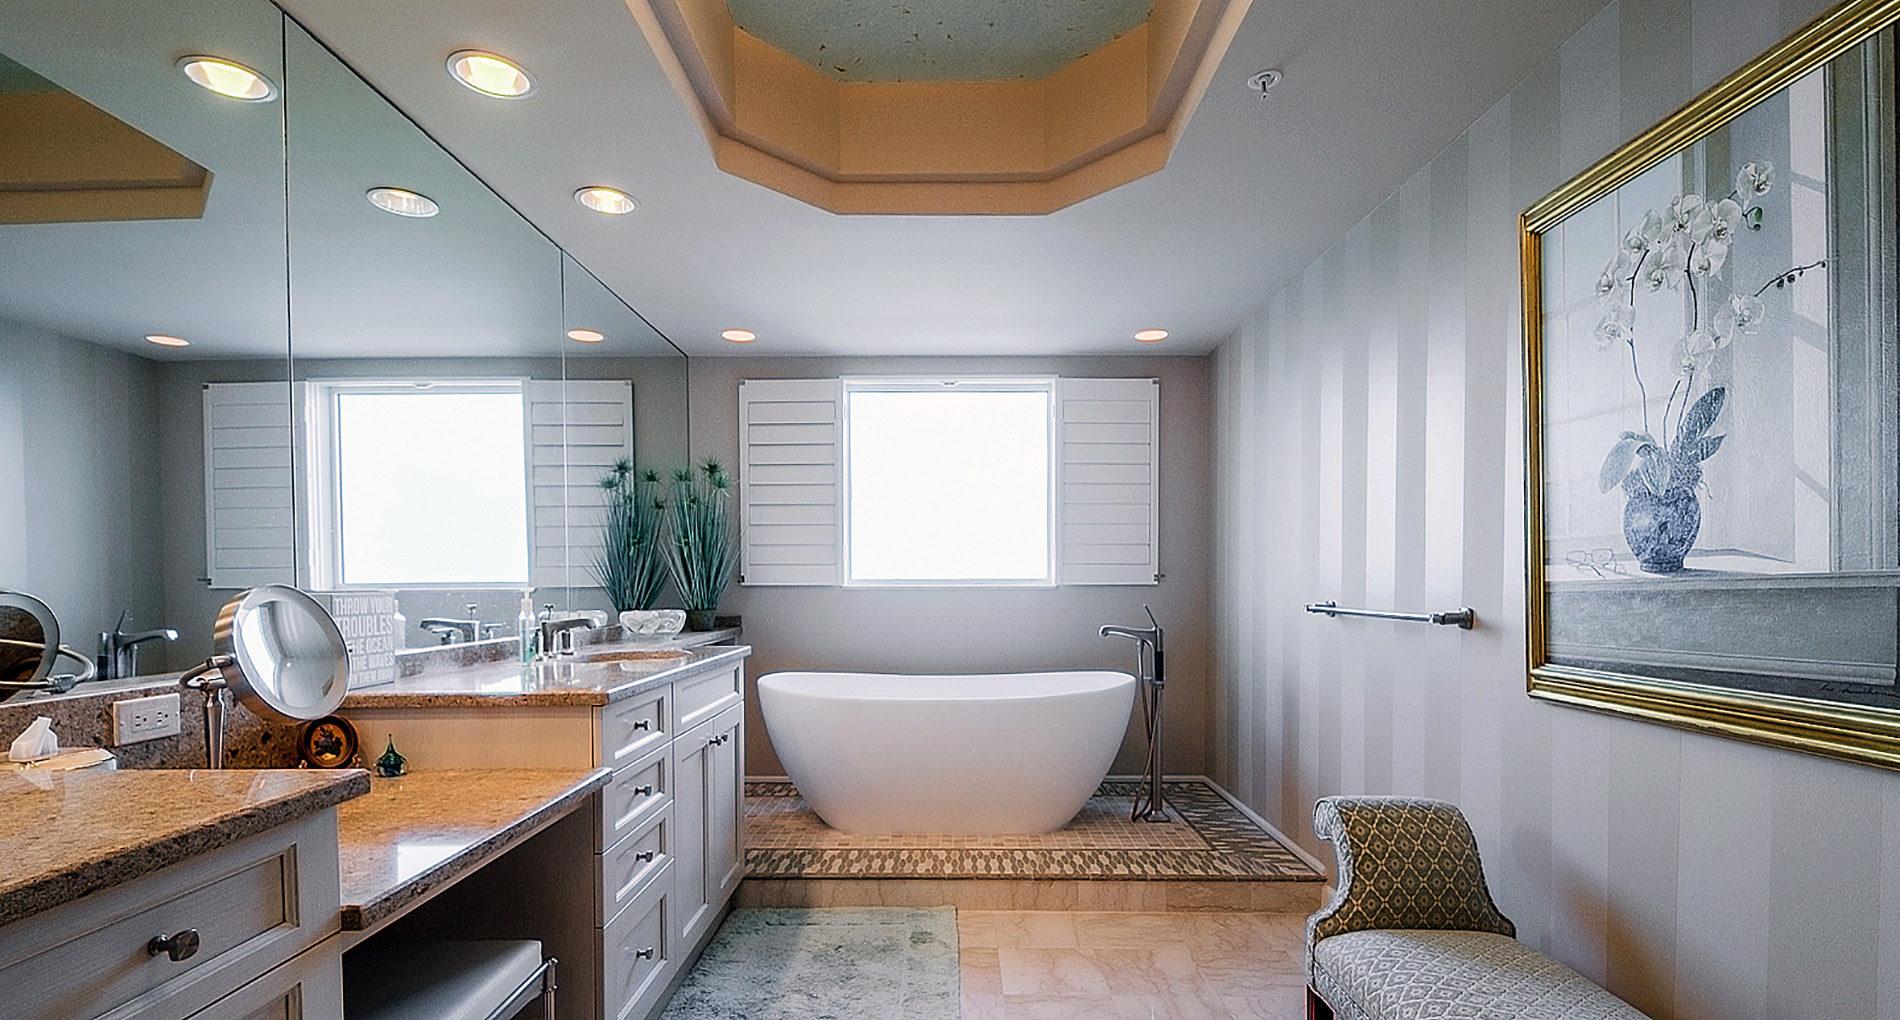 Bathroom Remodel Bonitasprings Baycolony Slider